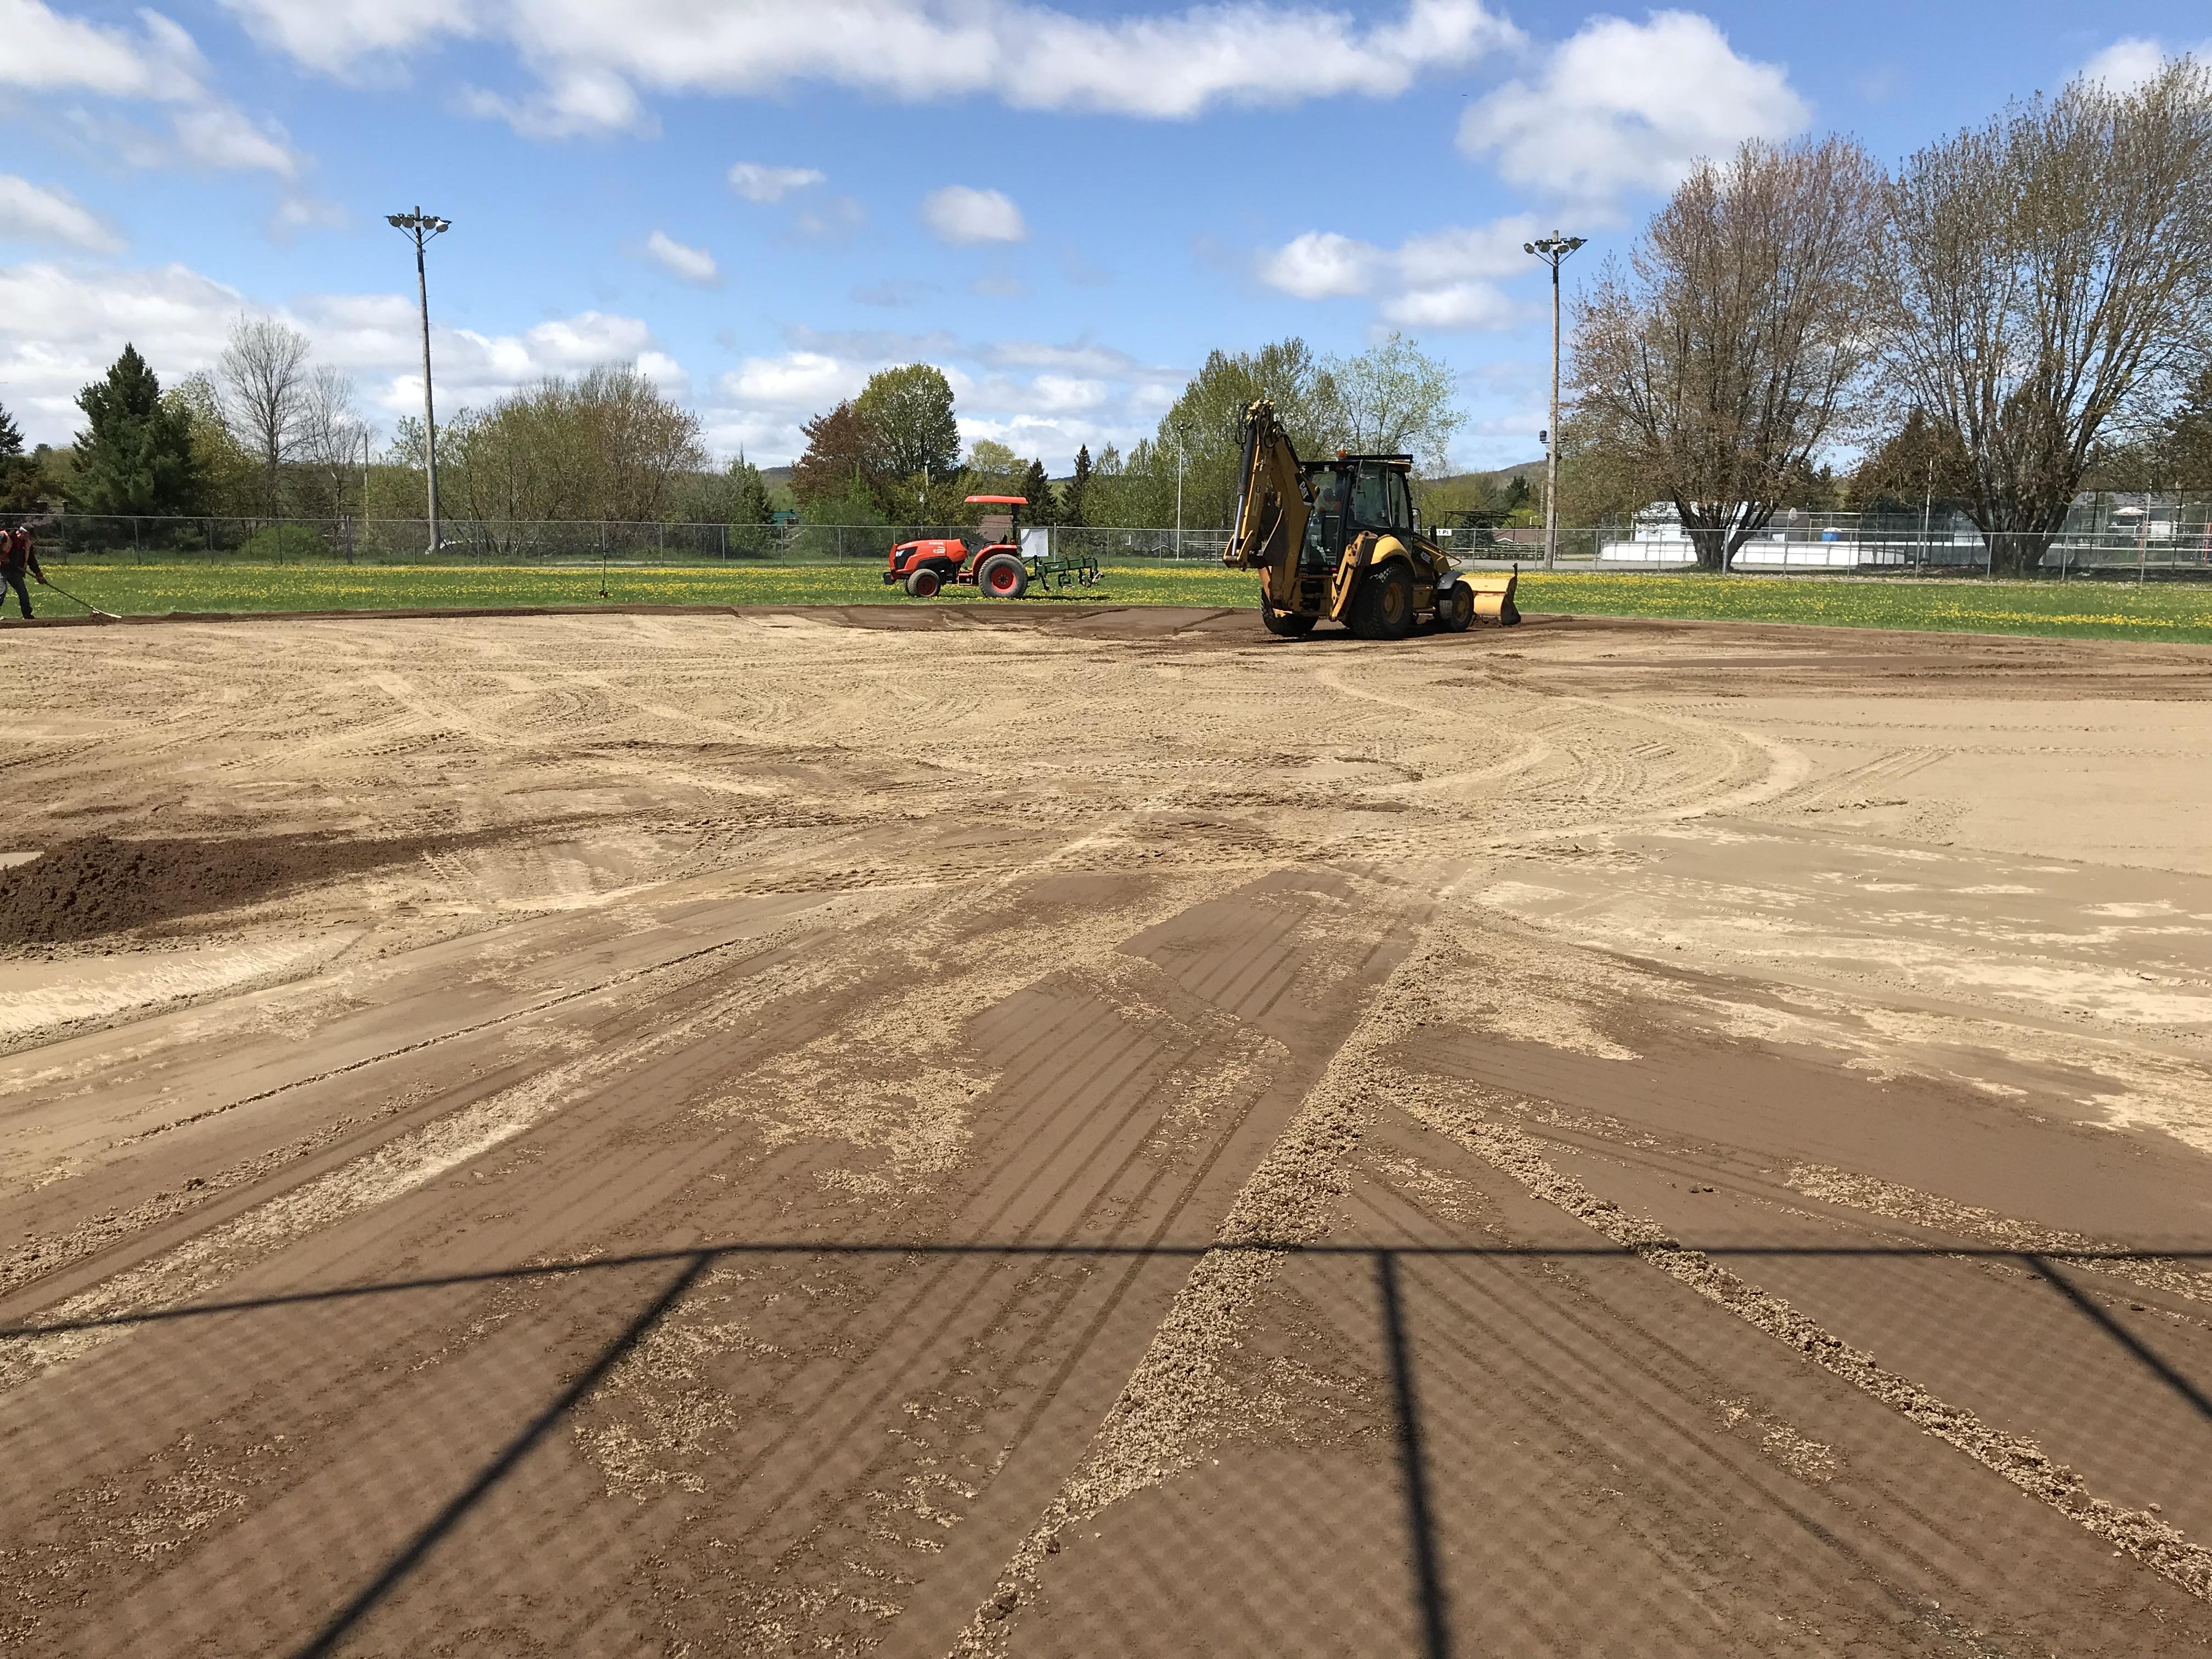 terrain de baseball machinerie